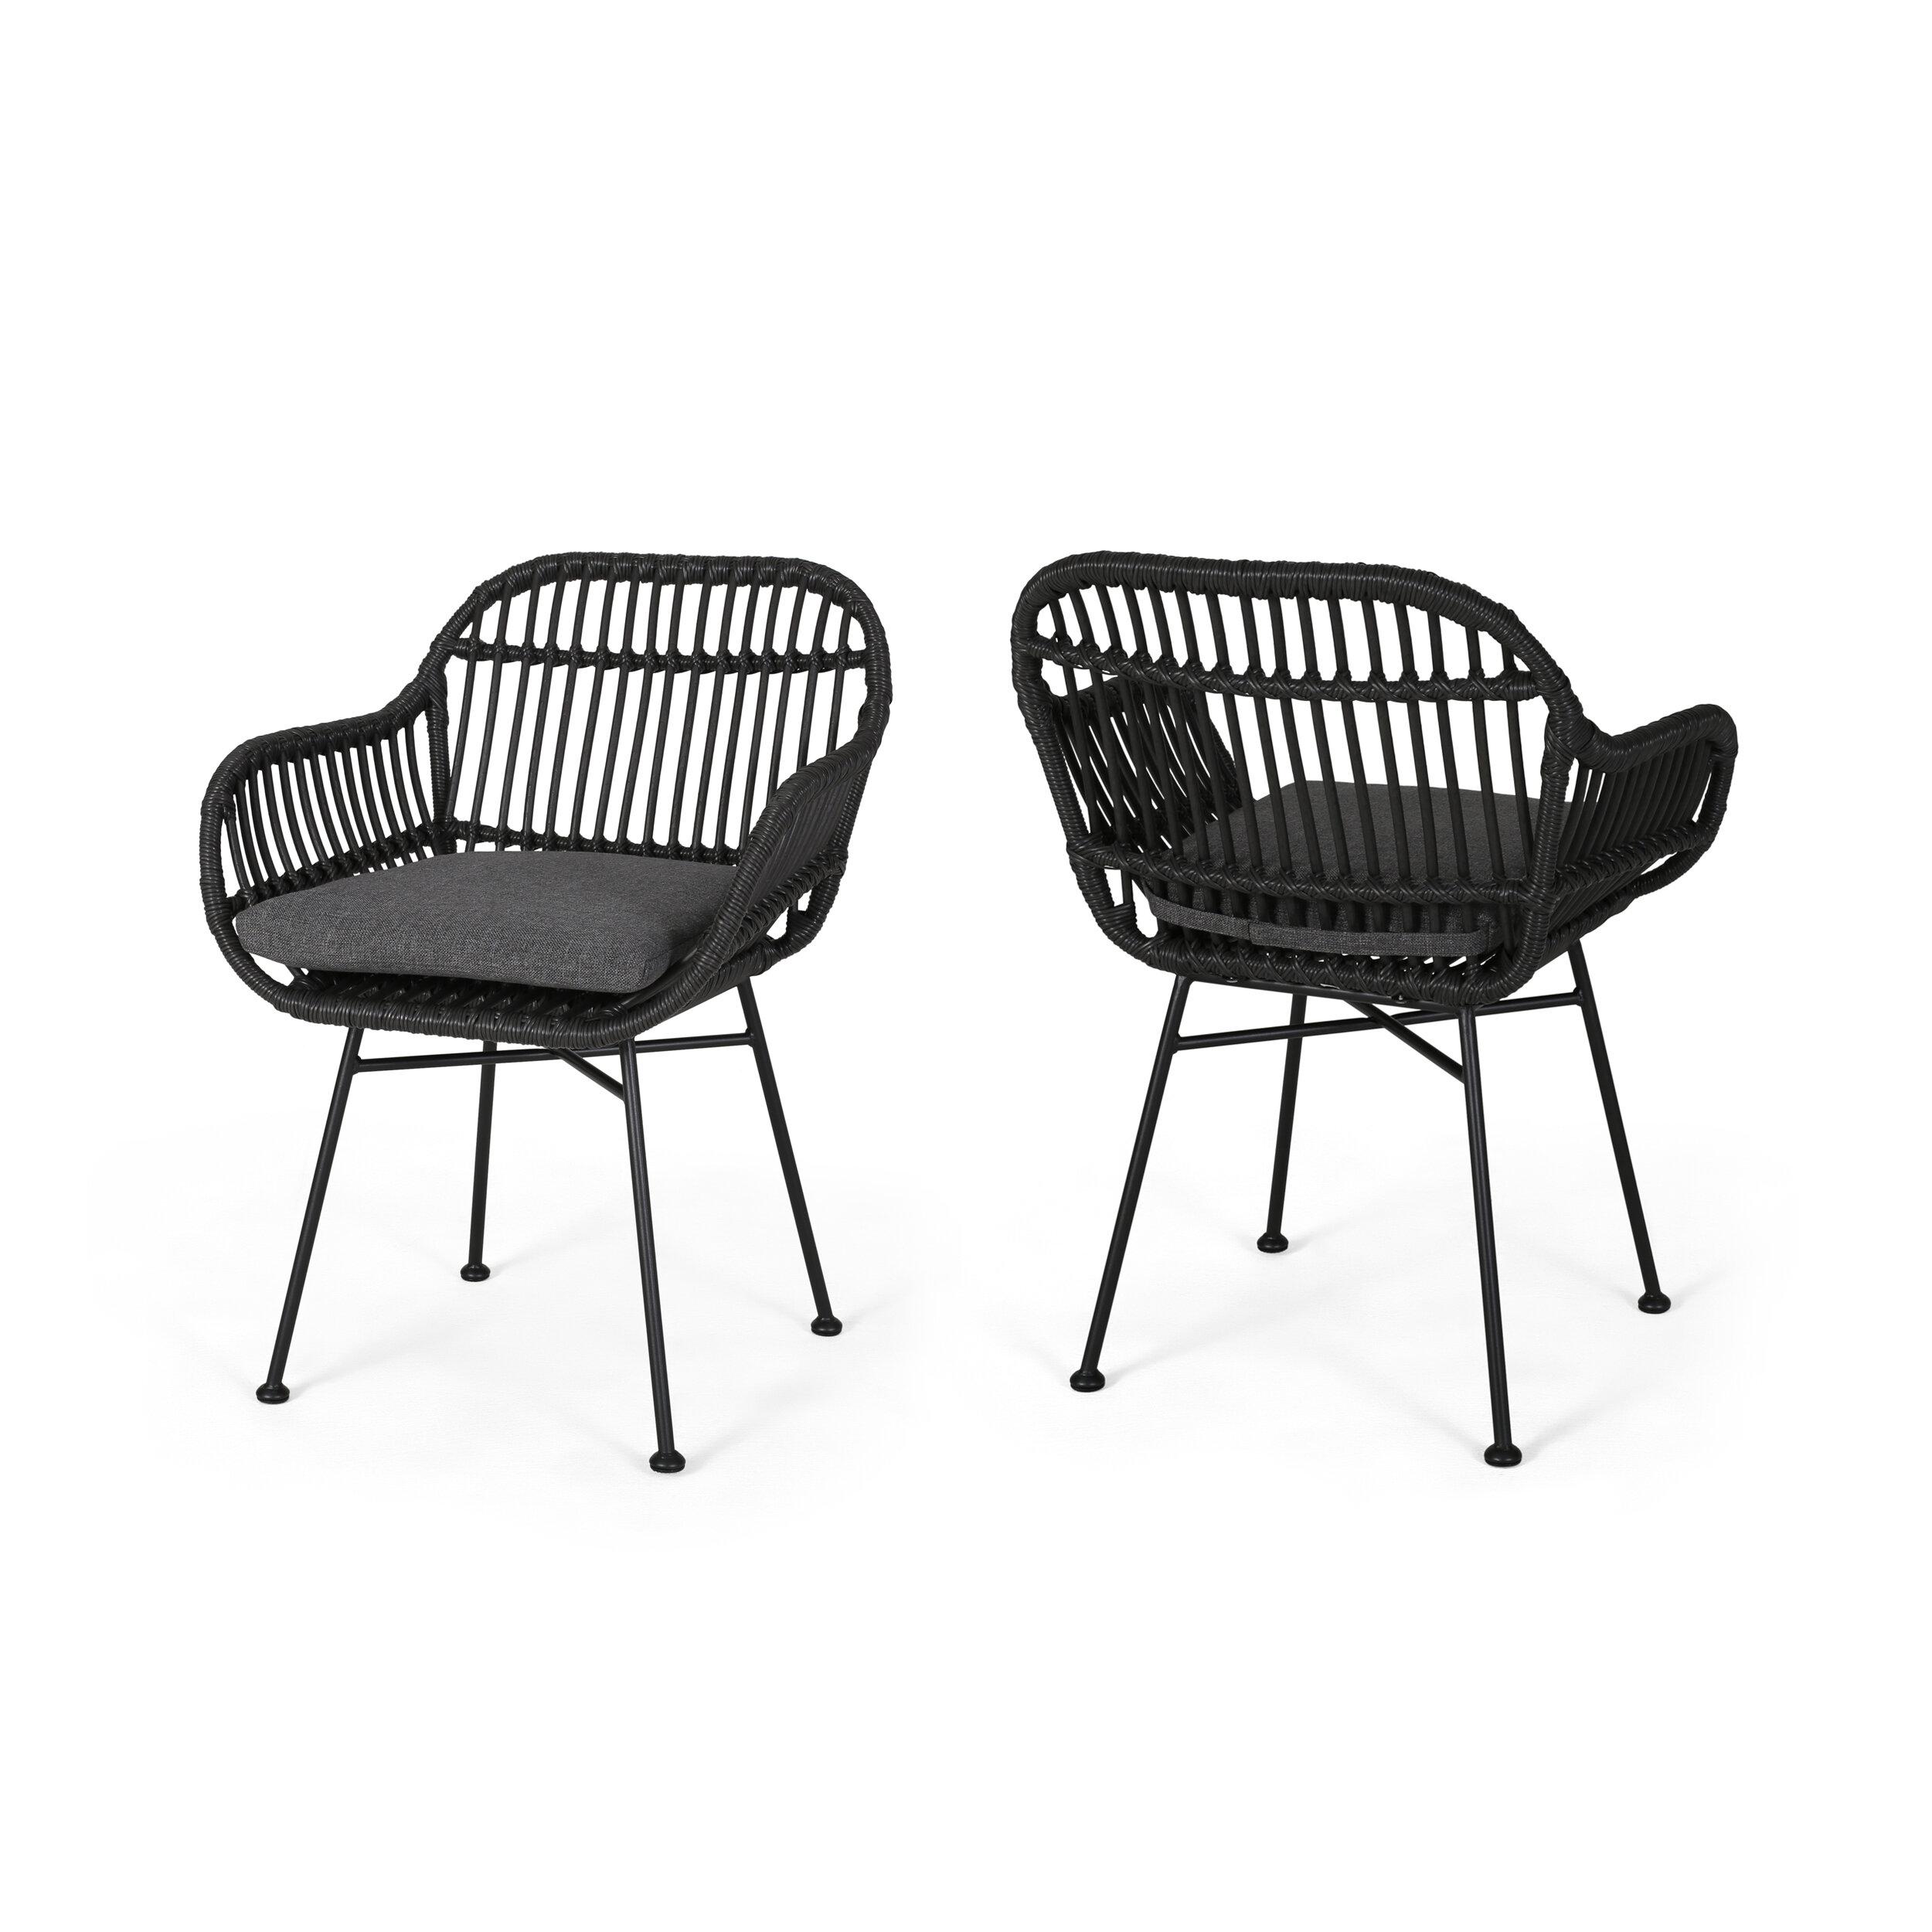 Awe Inspiring Maspeth Outdoor Woven Patio Chair With Cushion Machost Co Dining Chair Design Ideas Machostcouk